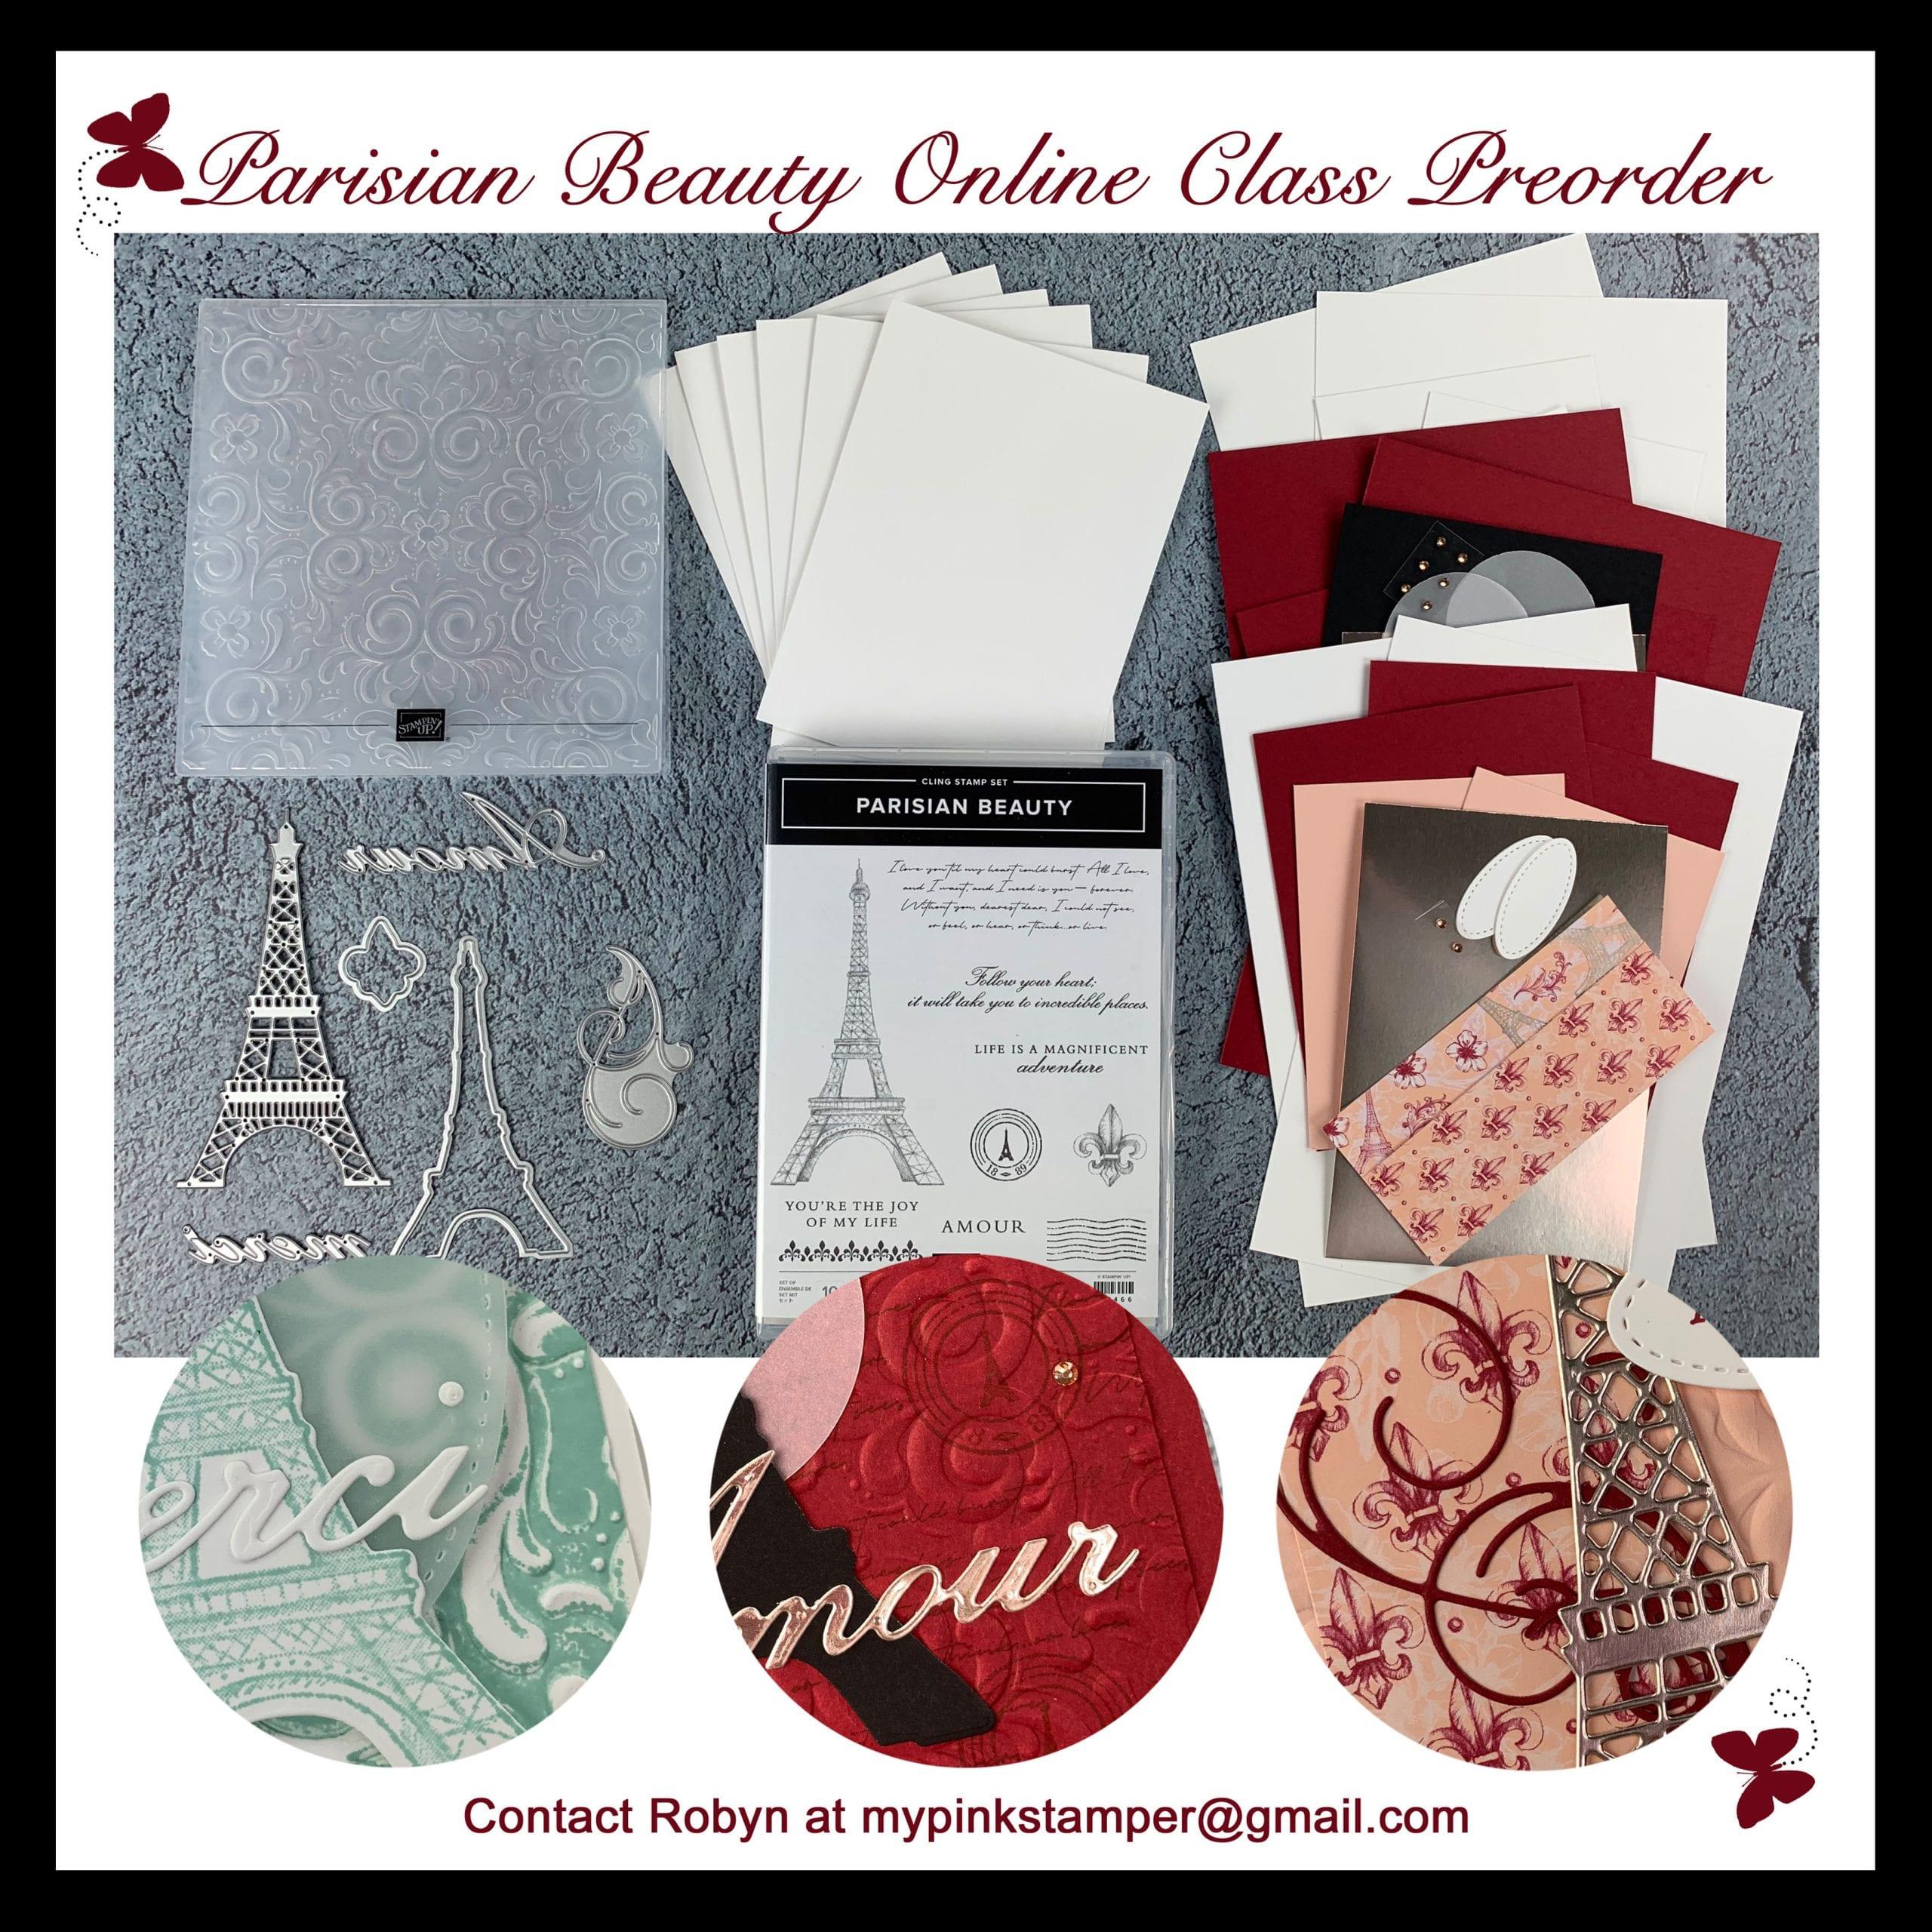 Stampin' Up! Parisian Beauty Online Class Preorder